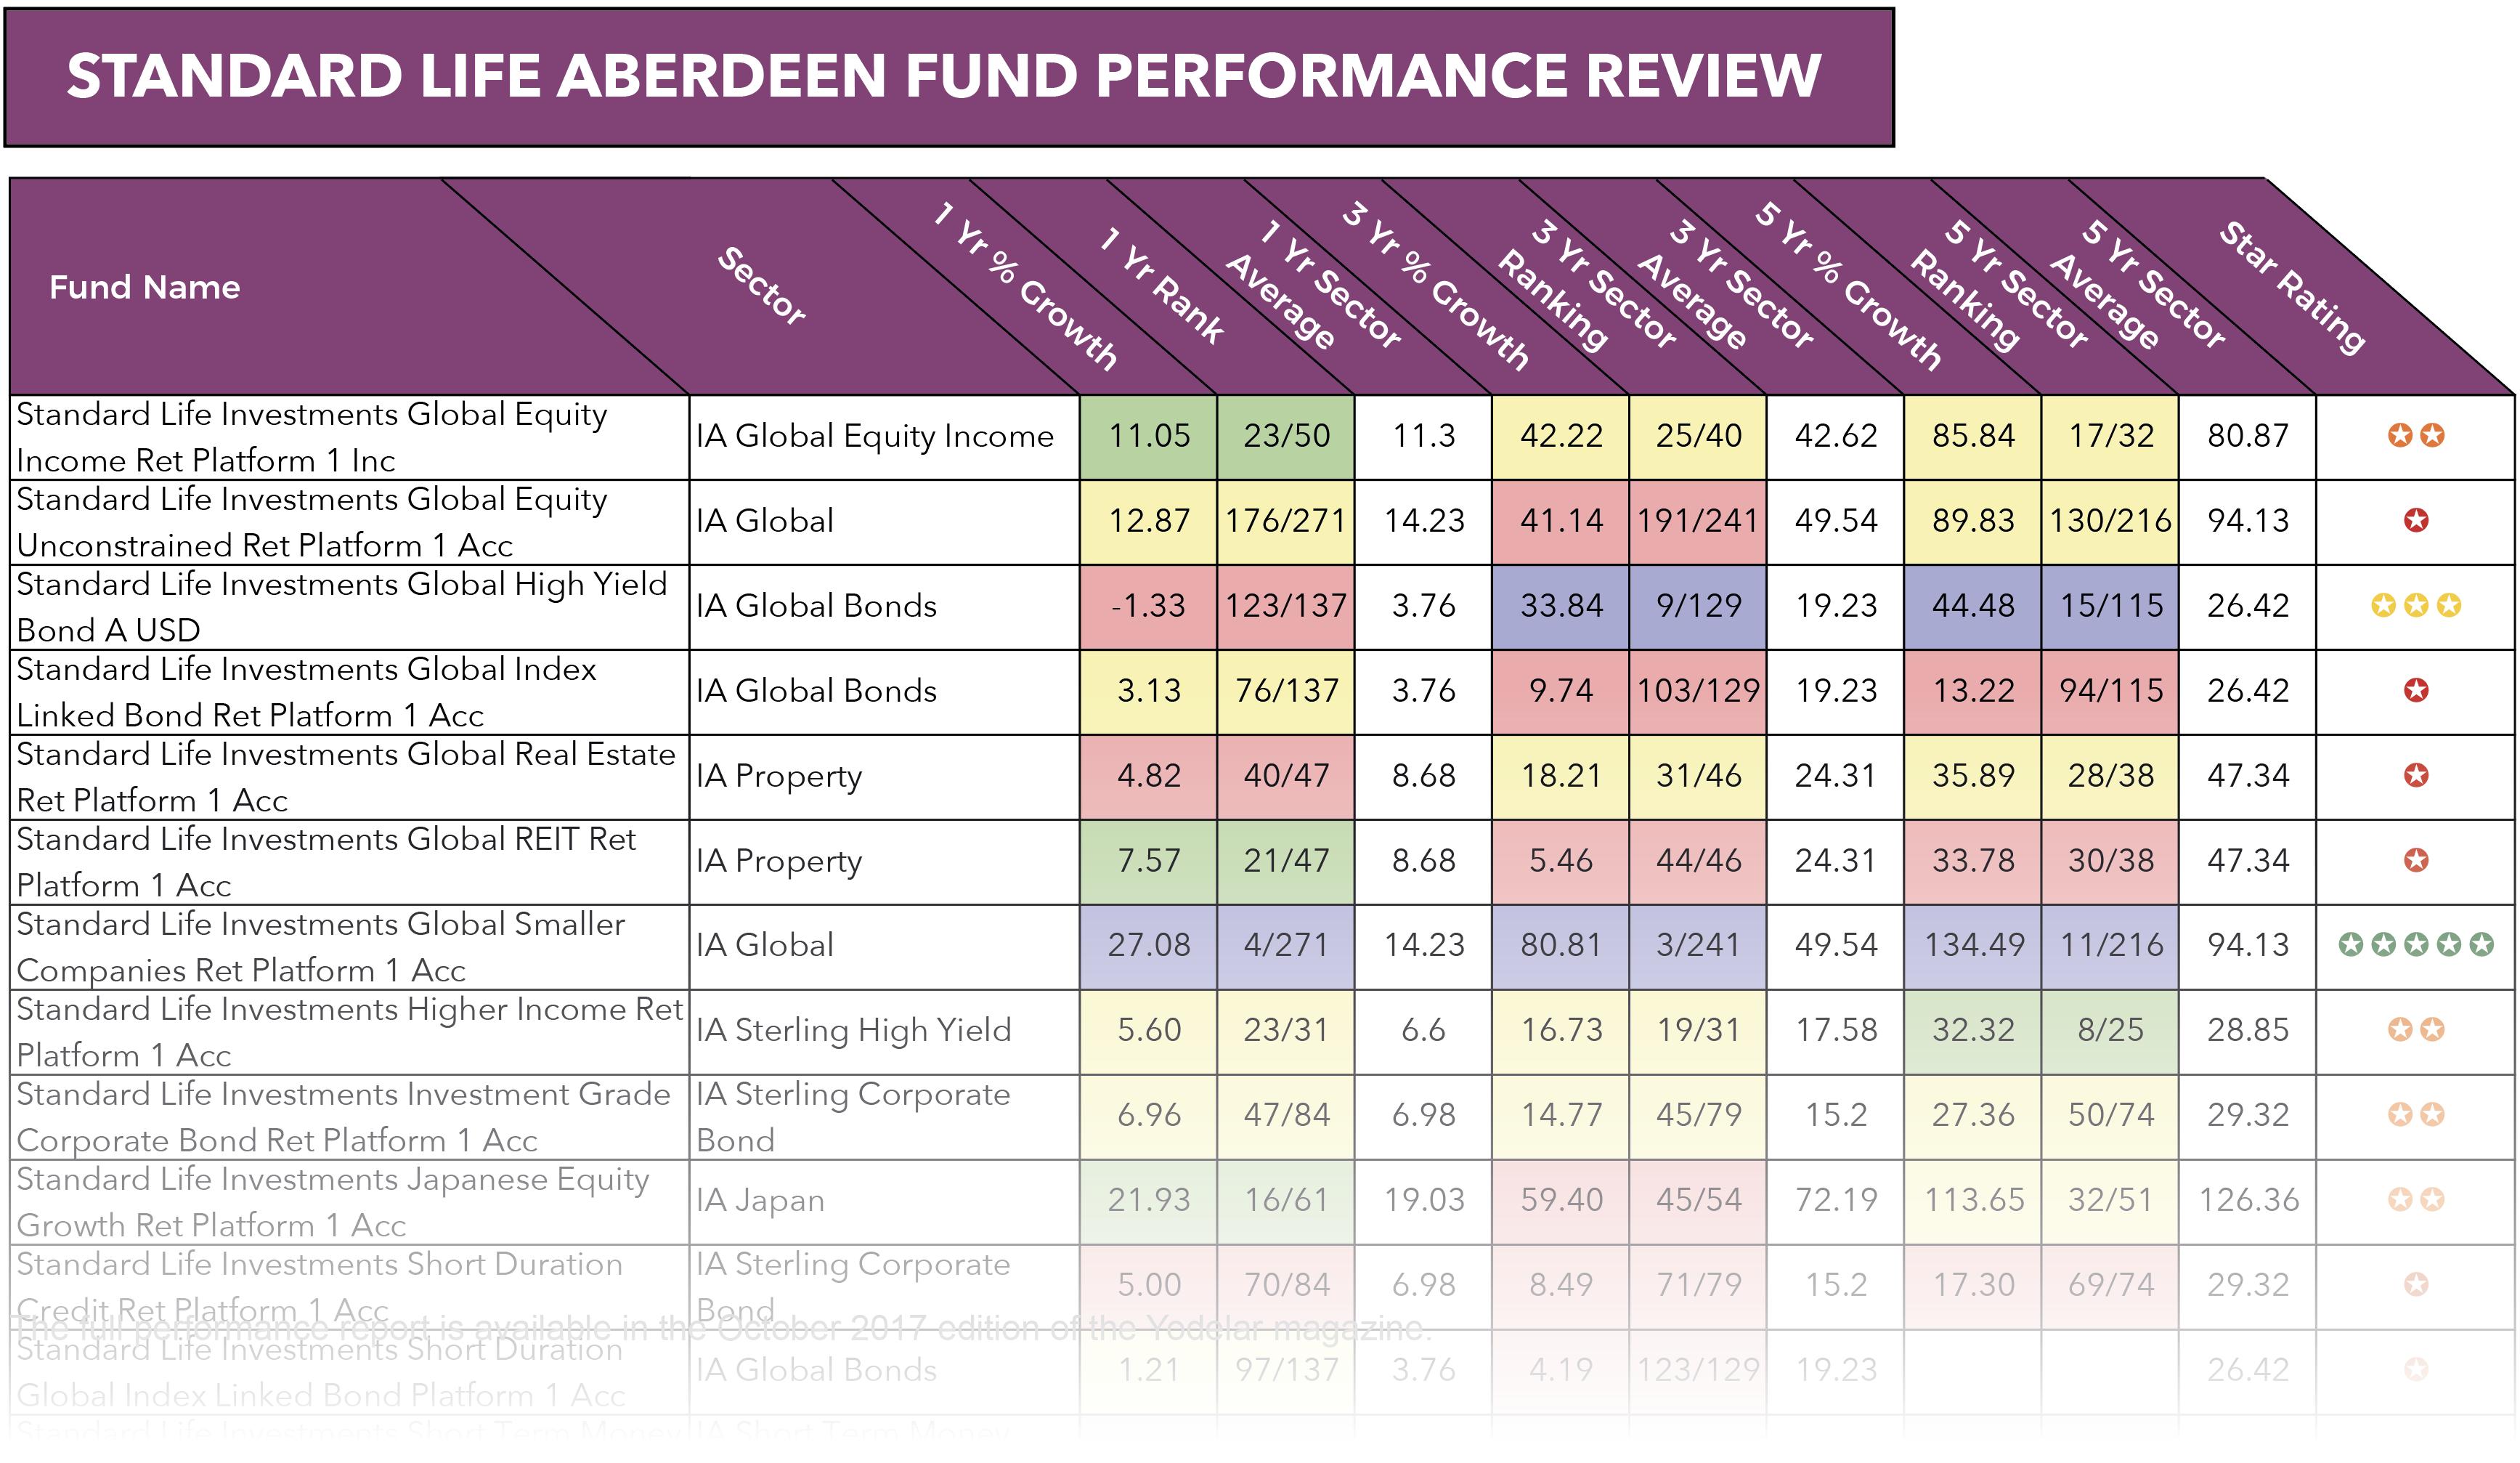 Standard life aberdeen fund performance sample.png